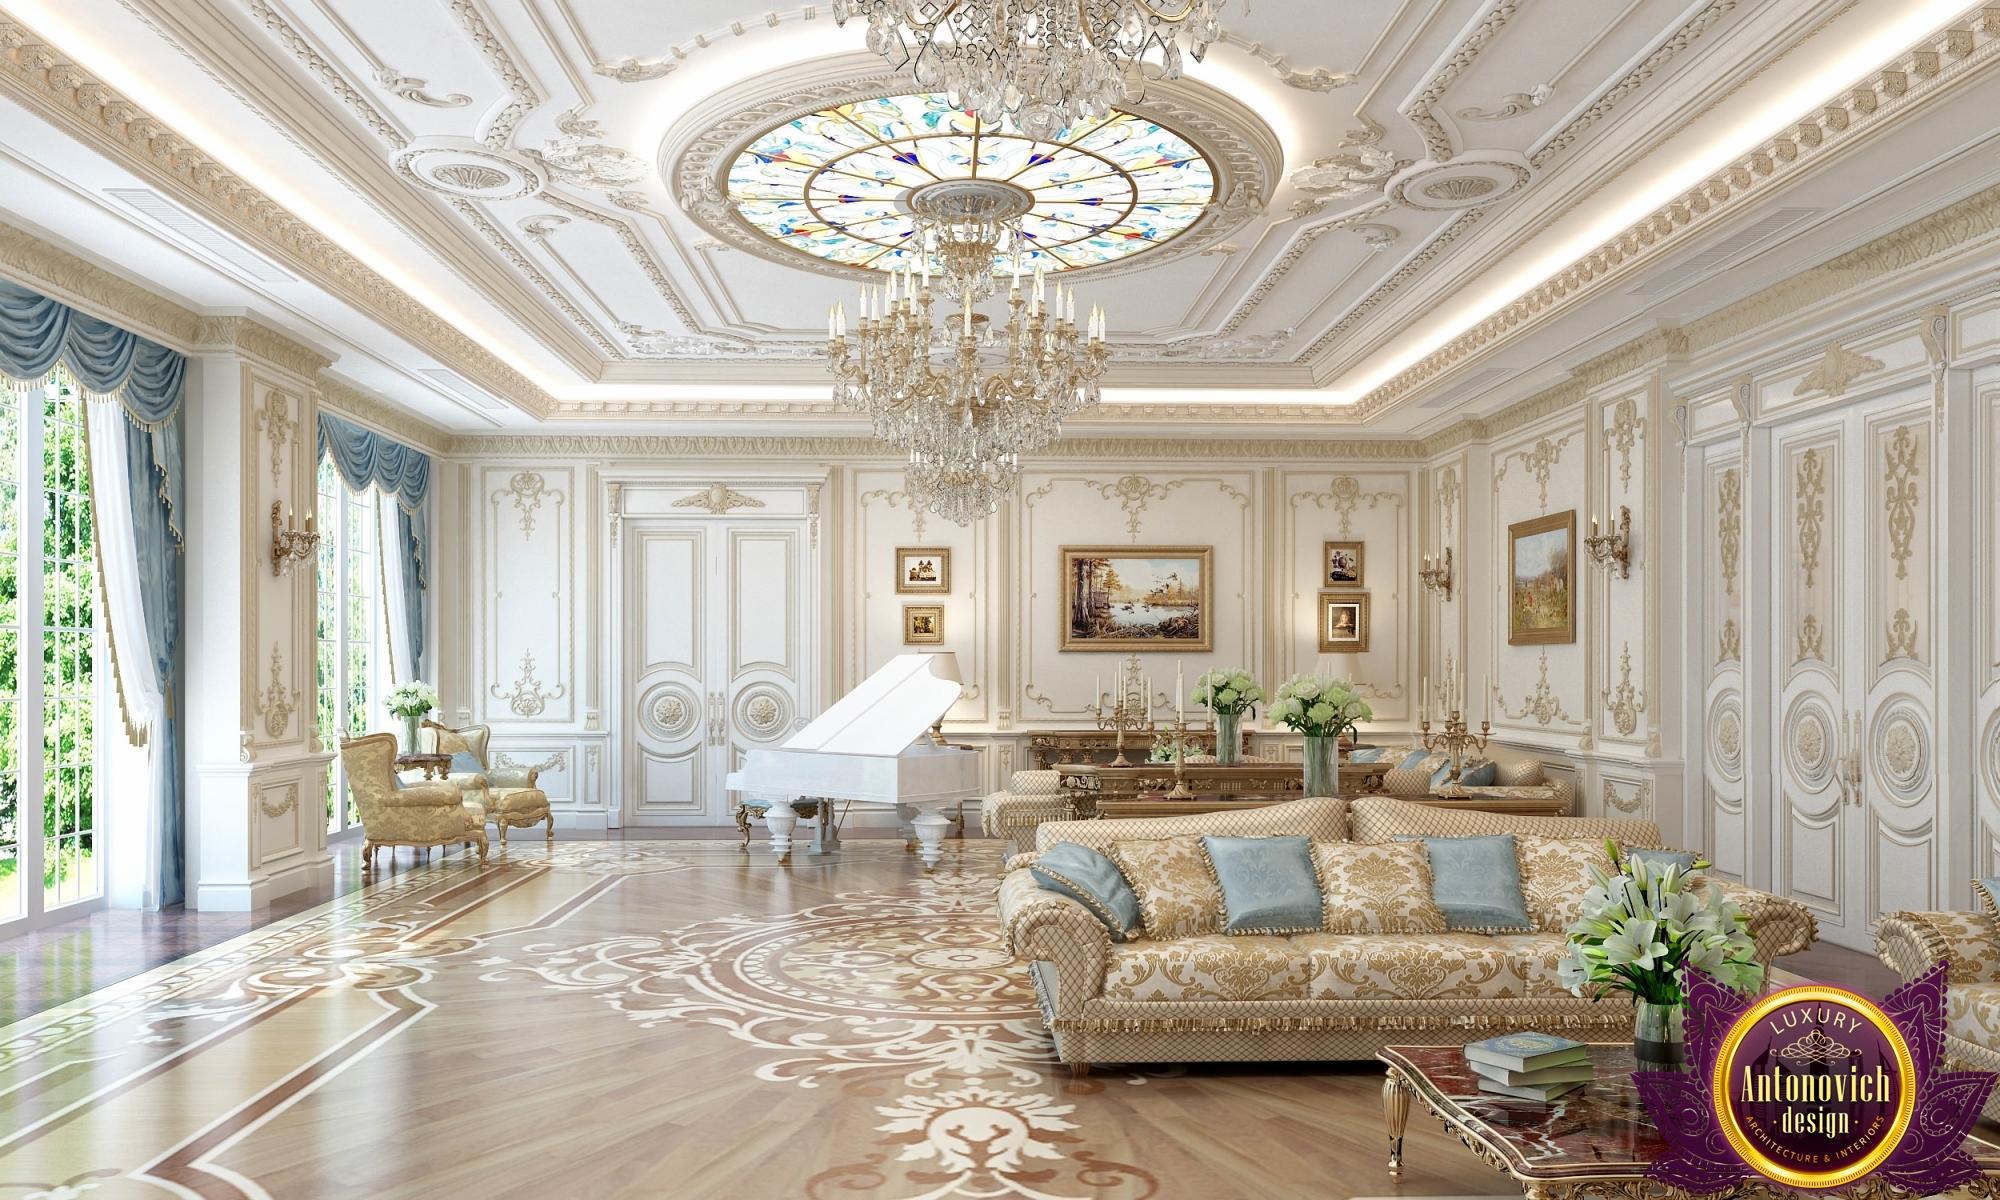 Free Photo Royal Room Architect Images Stock Free